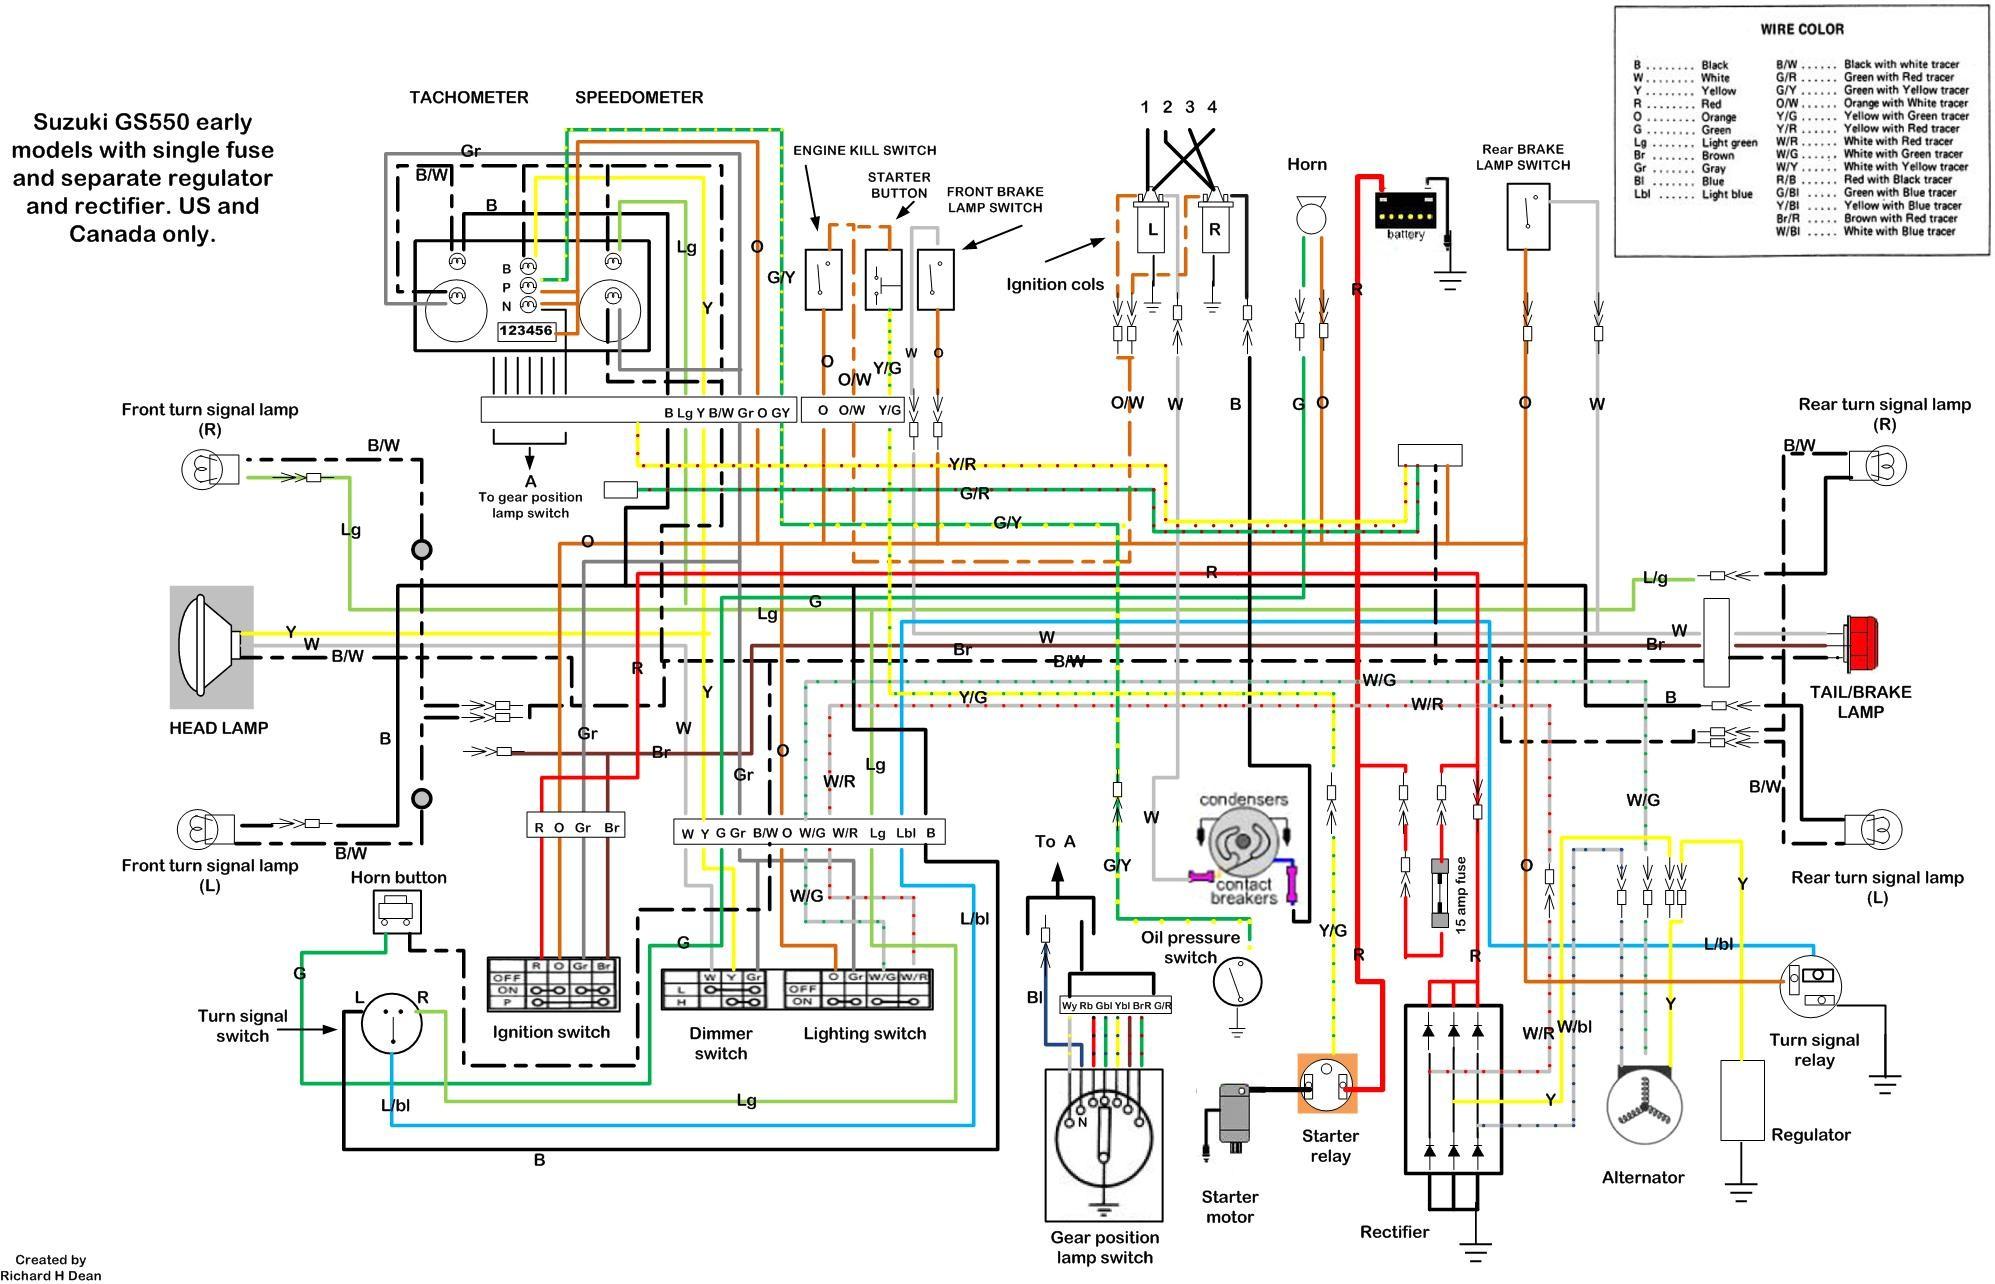 Wiring Diagram Rz350